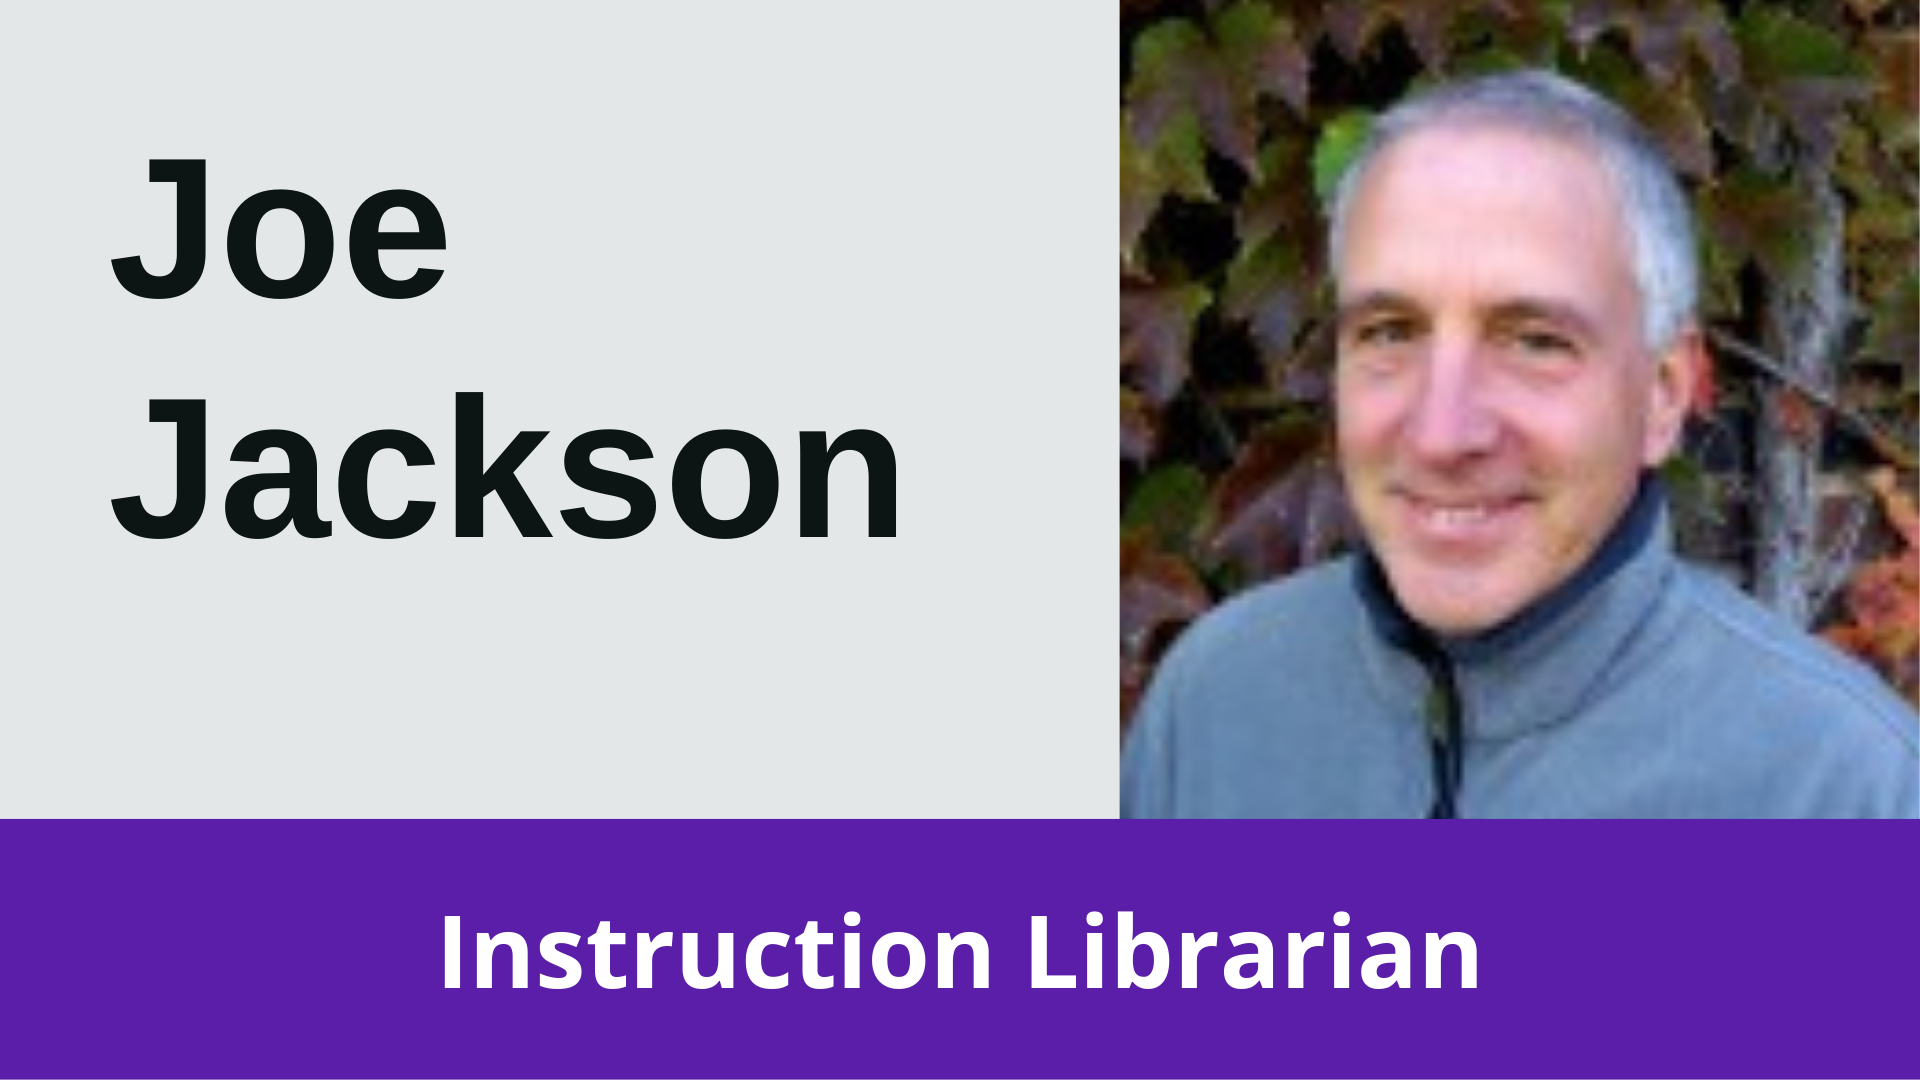 Joe Jackson Instruction Librarian